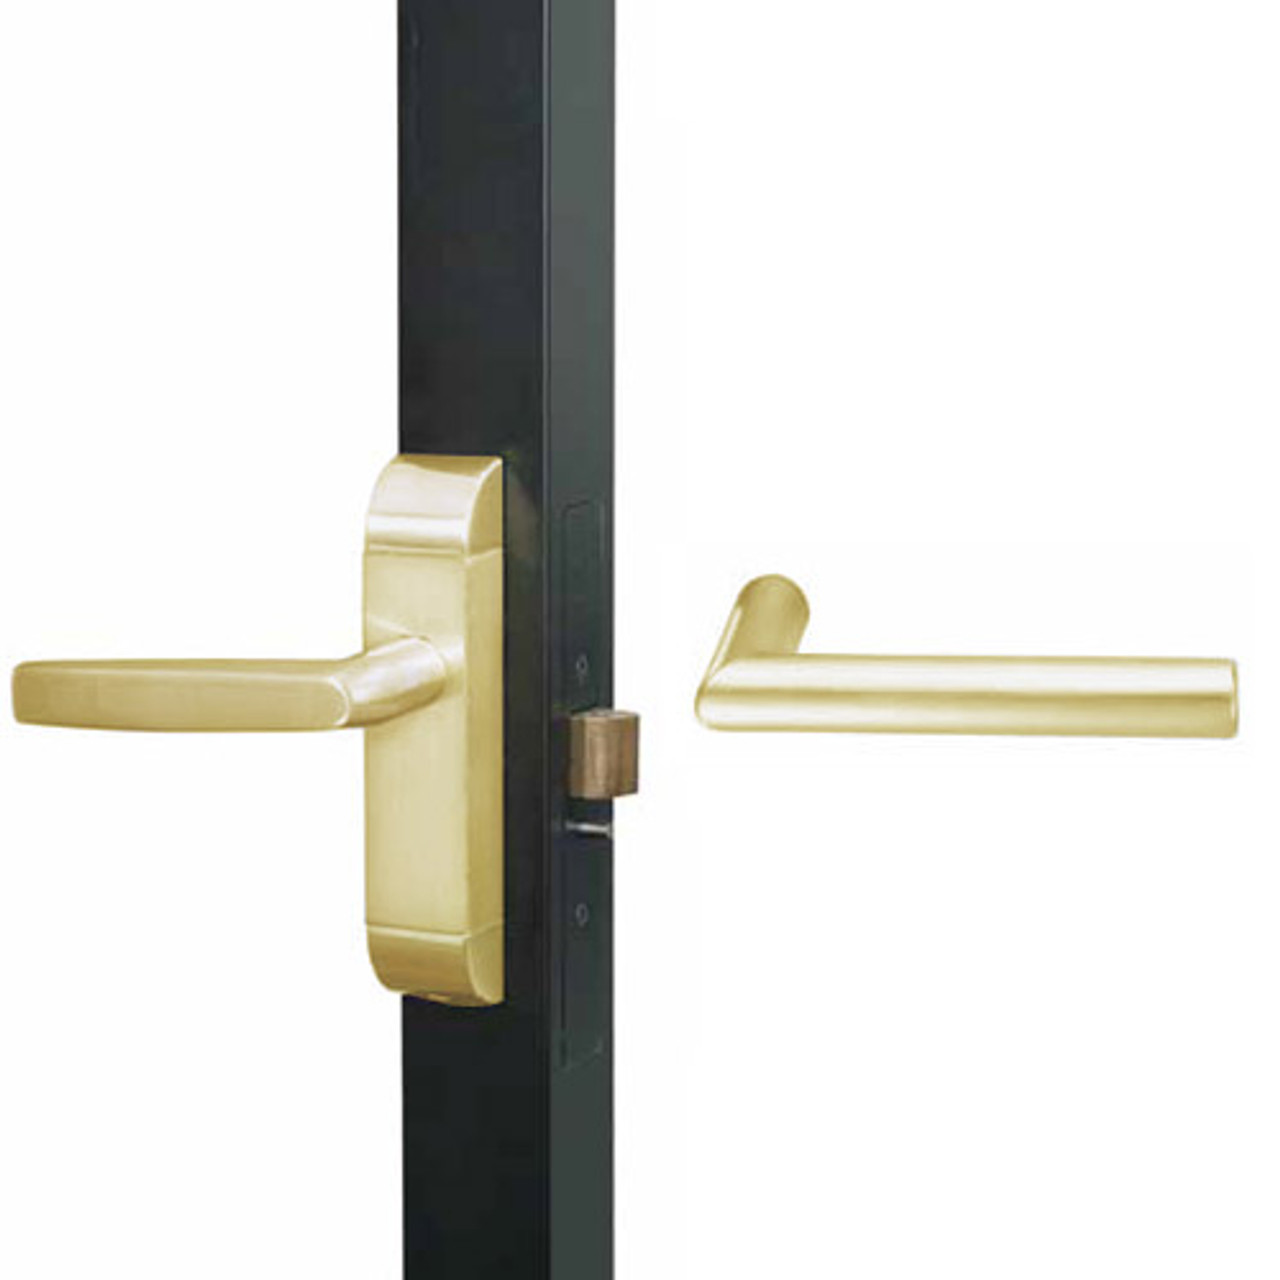 4600M-MI-652-US4 Adams Rite MI Designer Deadlatch handle in Satin Brass Finish